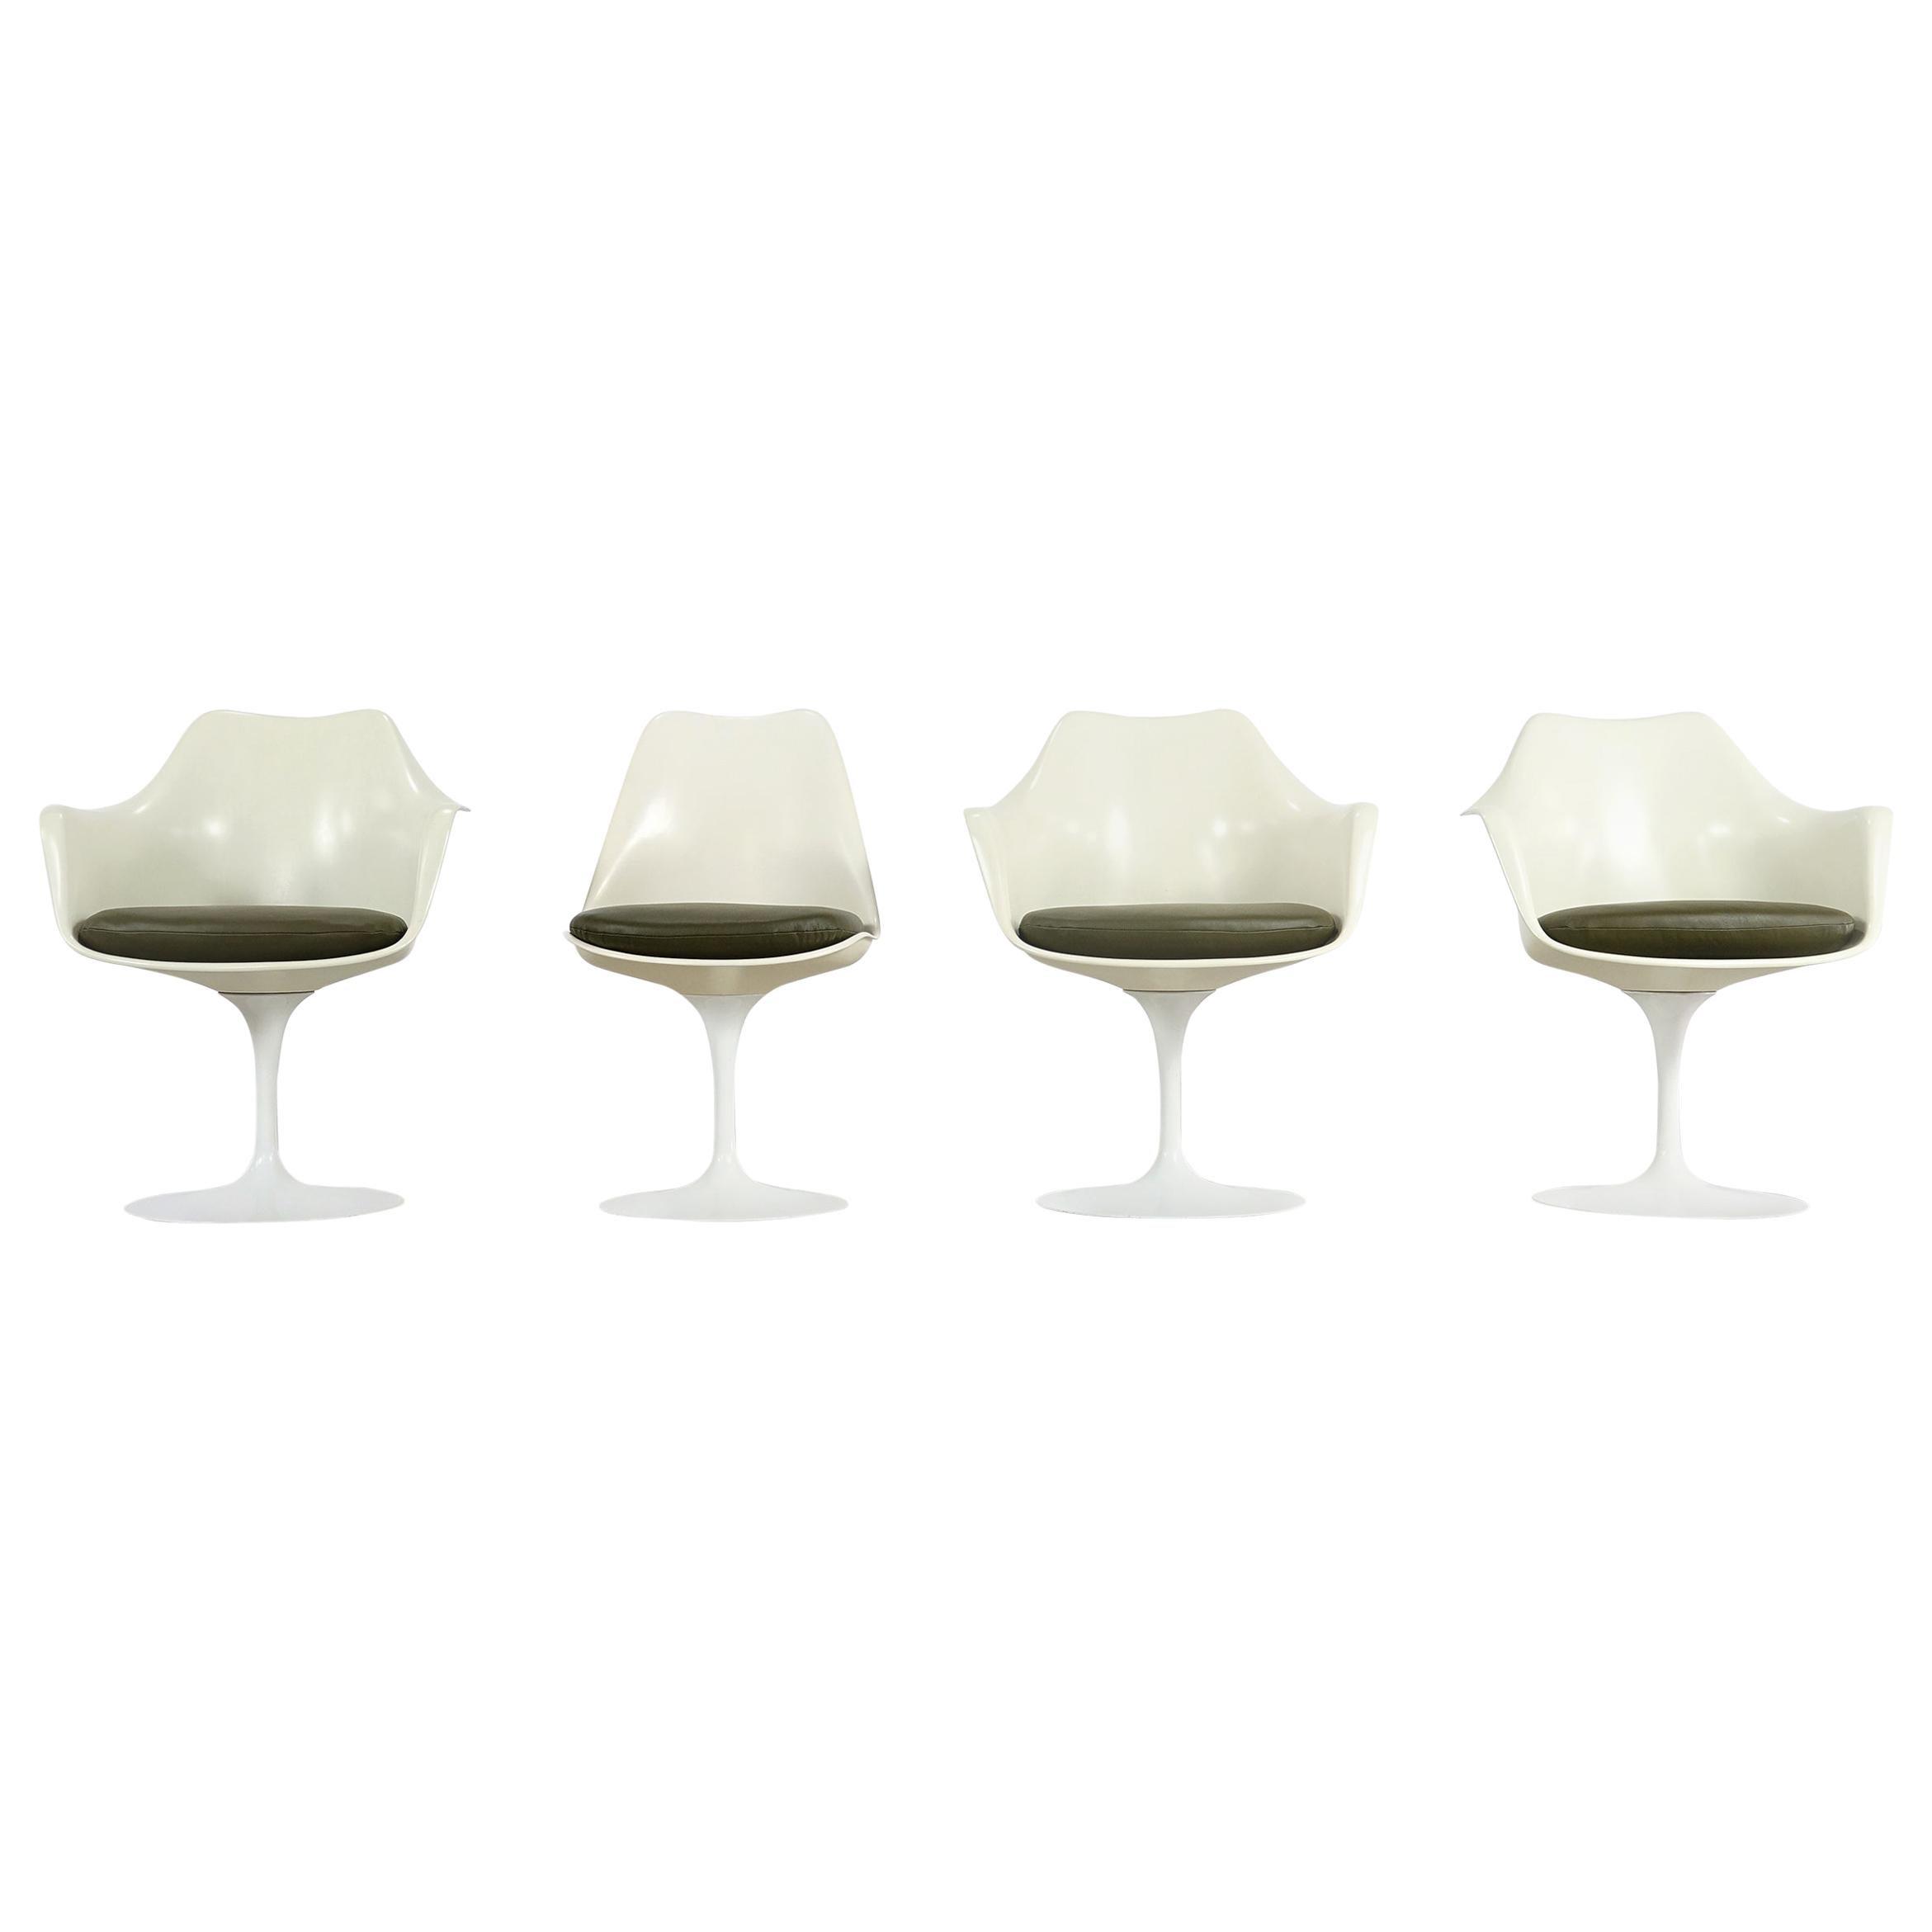 Eero Saarinen Early Tulip Armchair 150 and Sidechair 151 for Knoll International